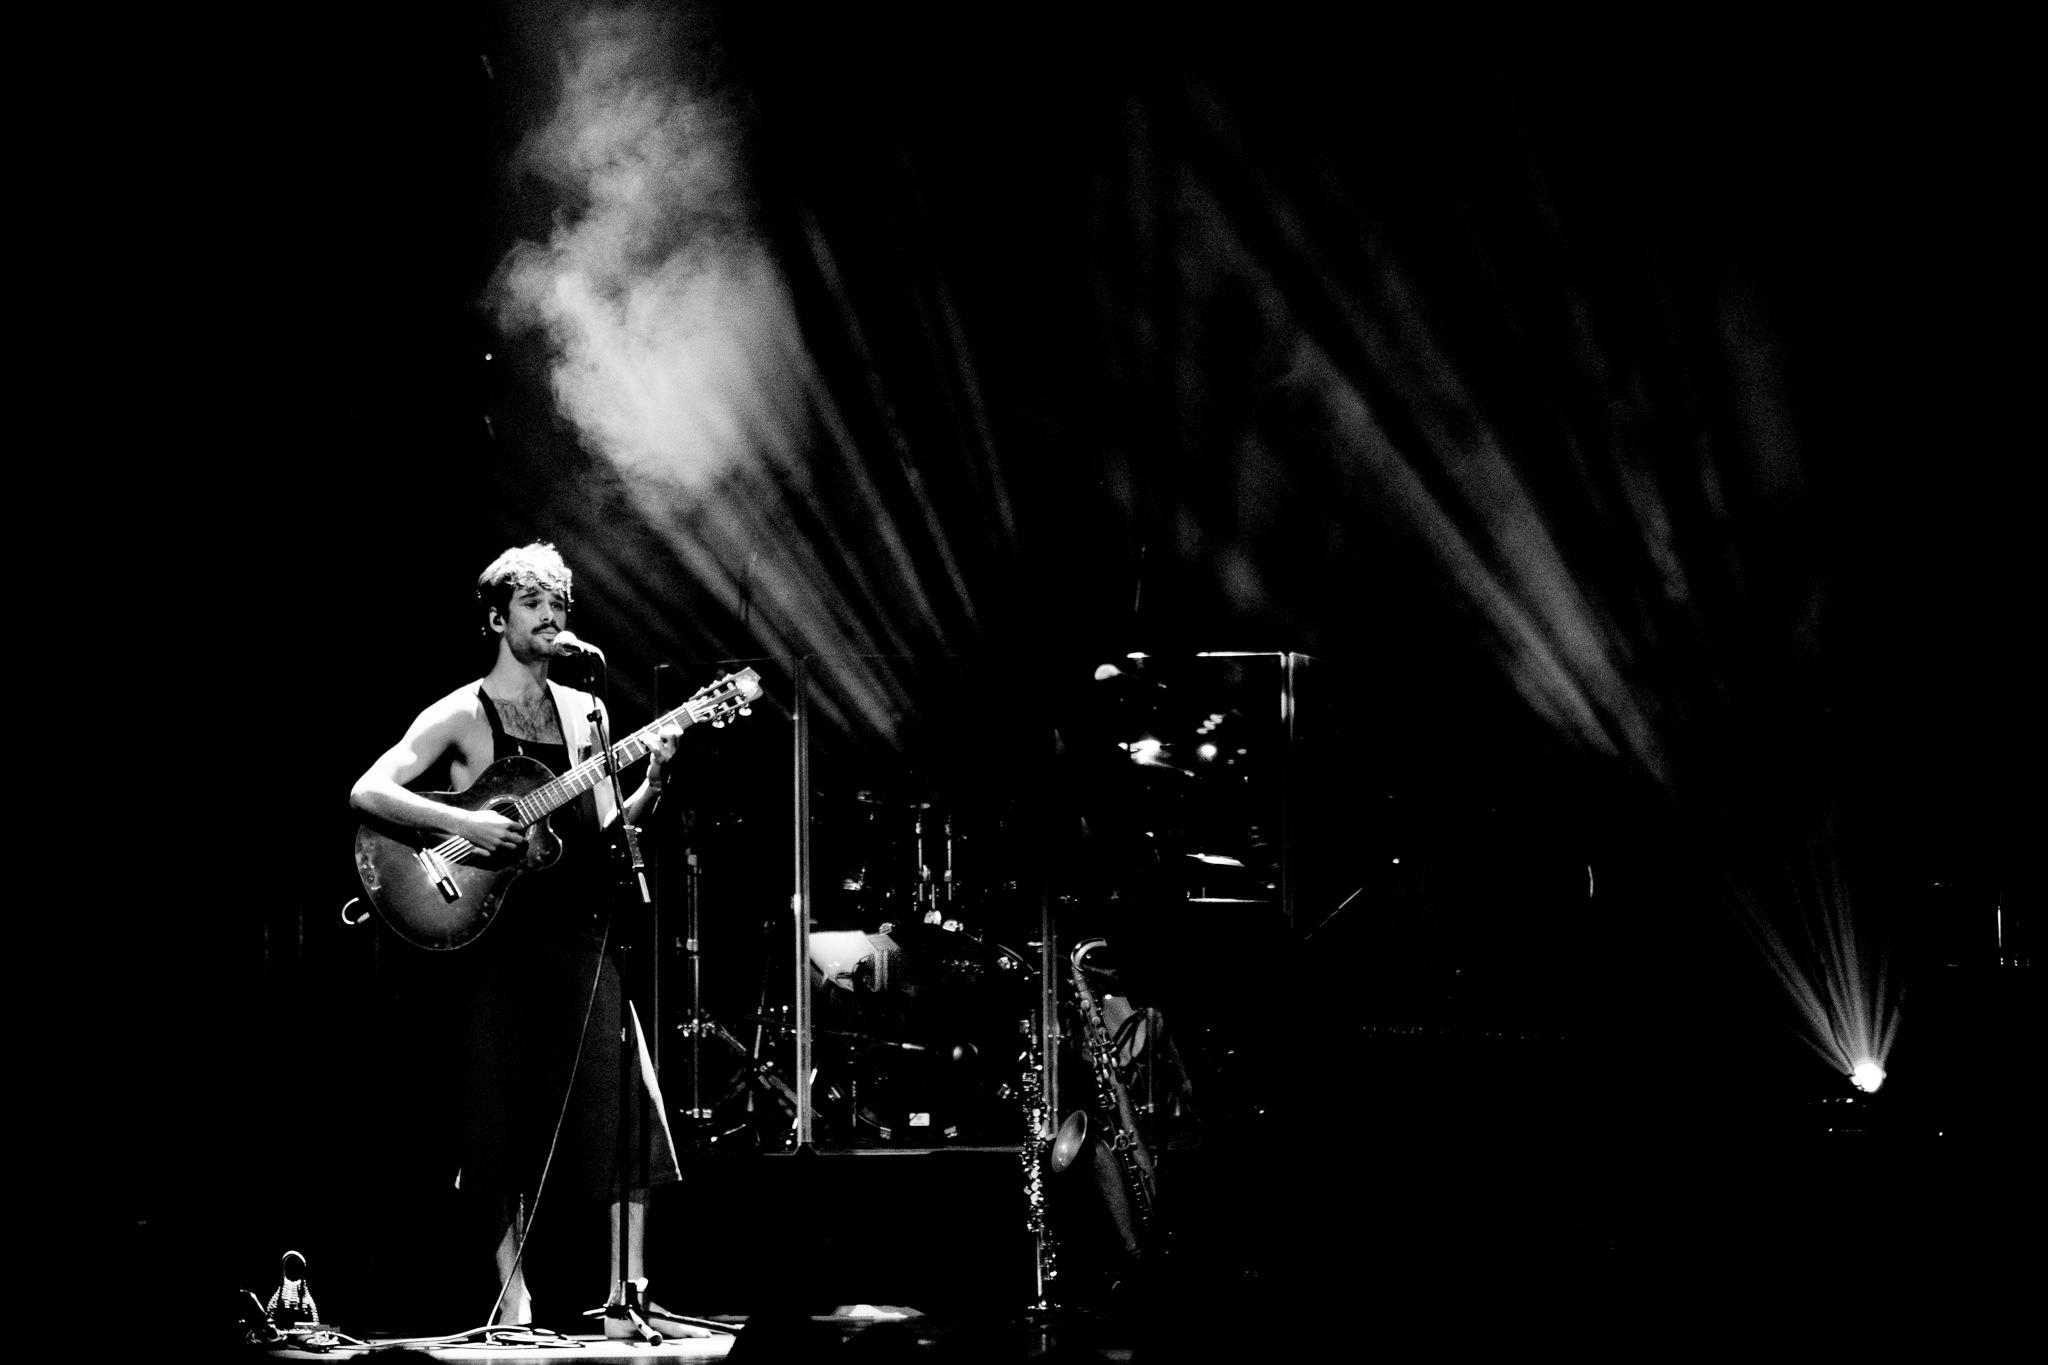 Milton Nascimento - Coliseu (Thrall Photography) - 0060.jpg